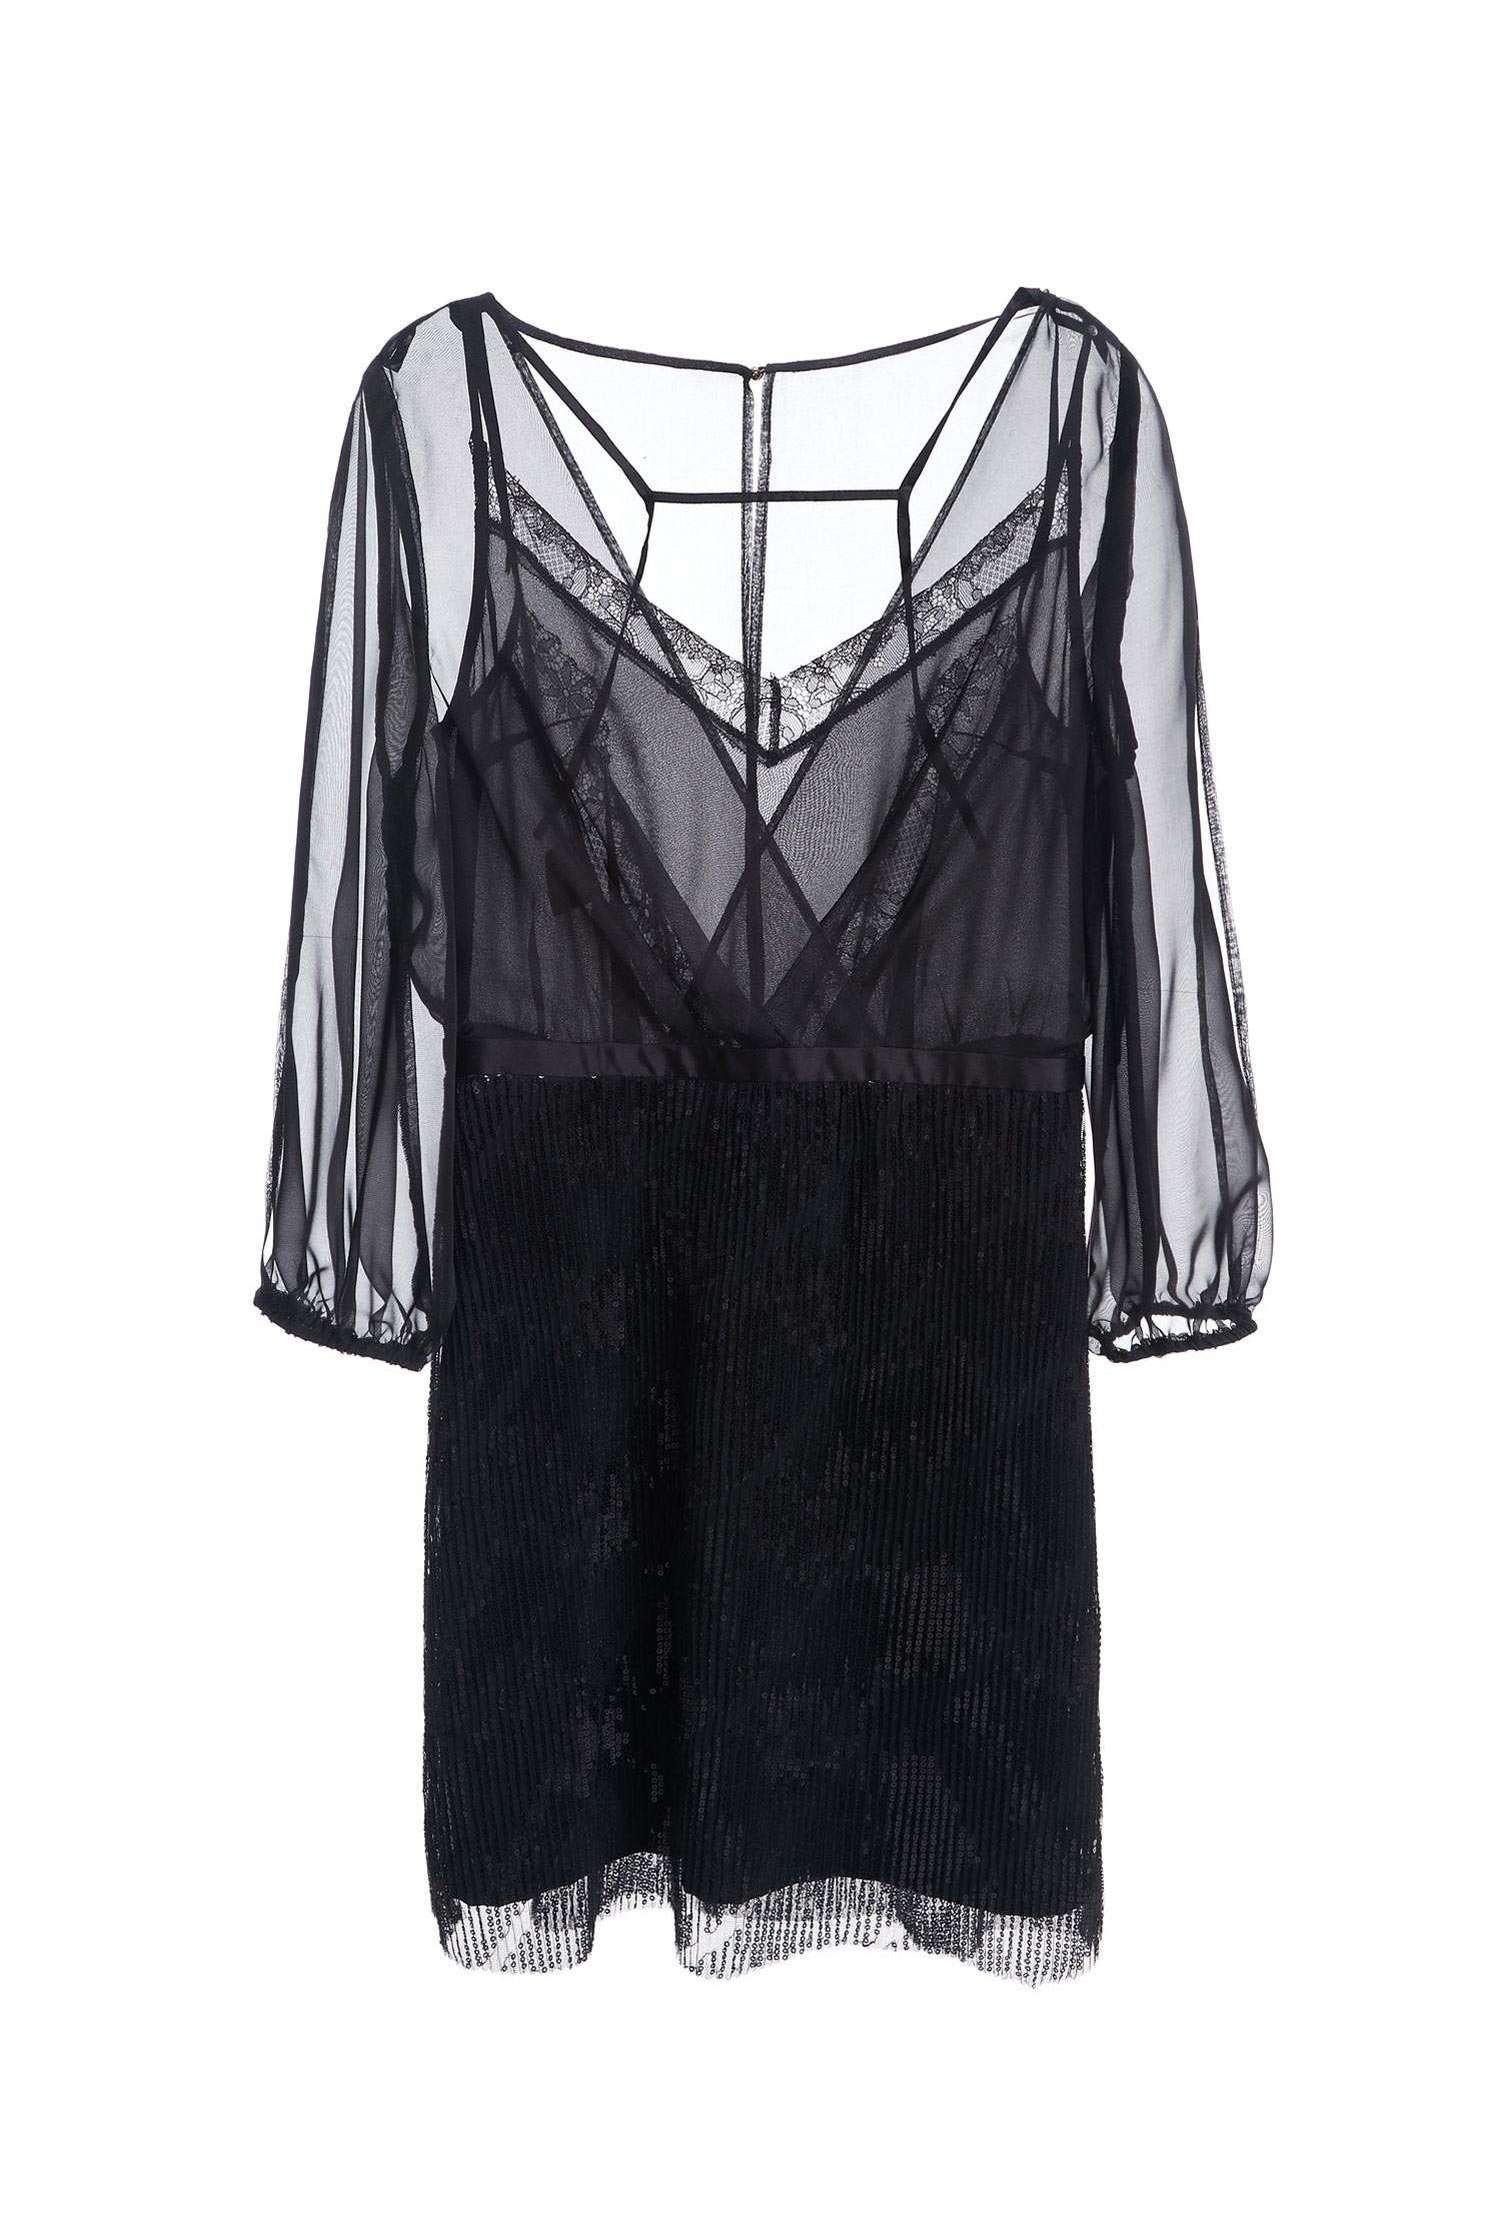 Organza sequin dress,Cocktail Dress,Evening Wear,細肩帶洋裝,透膚洋裝,Black dress